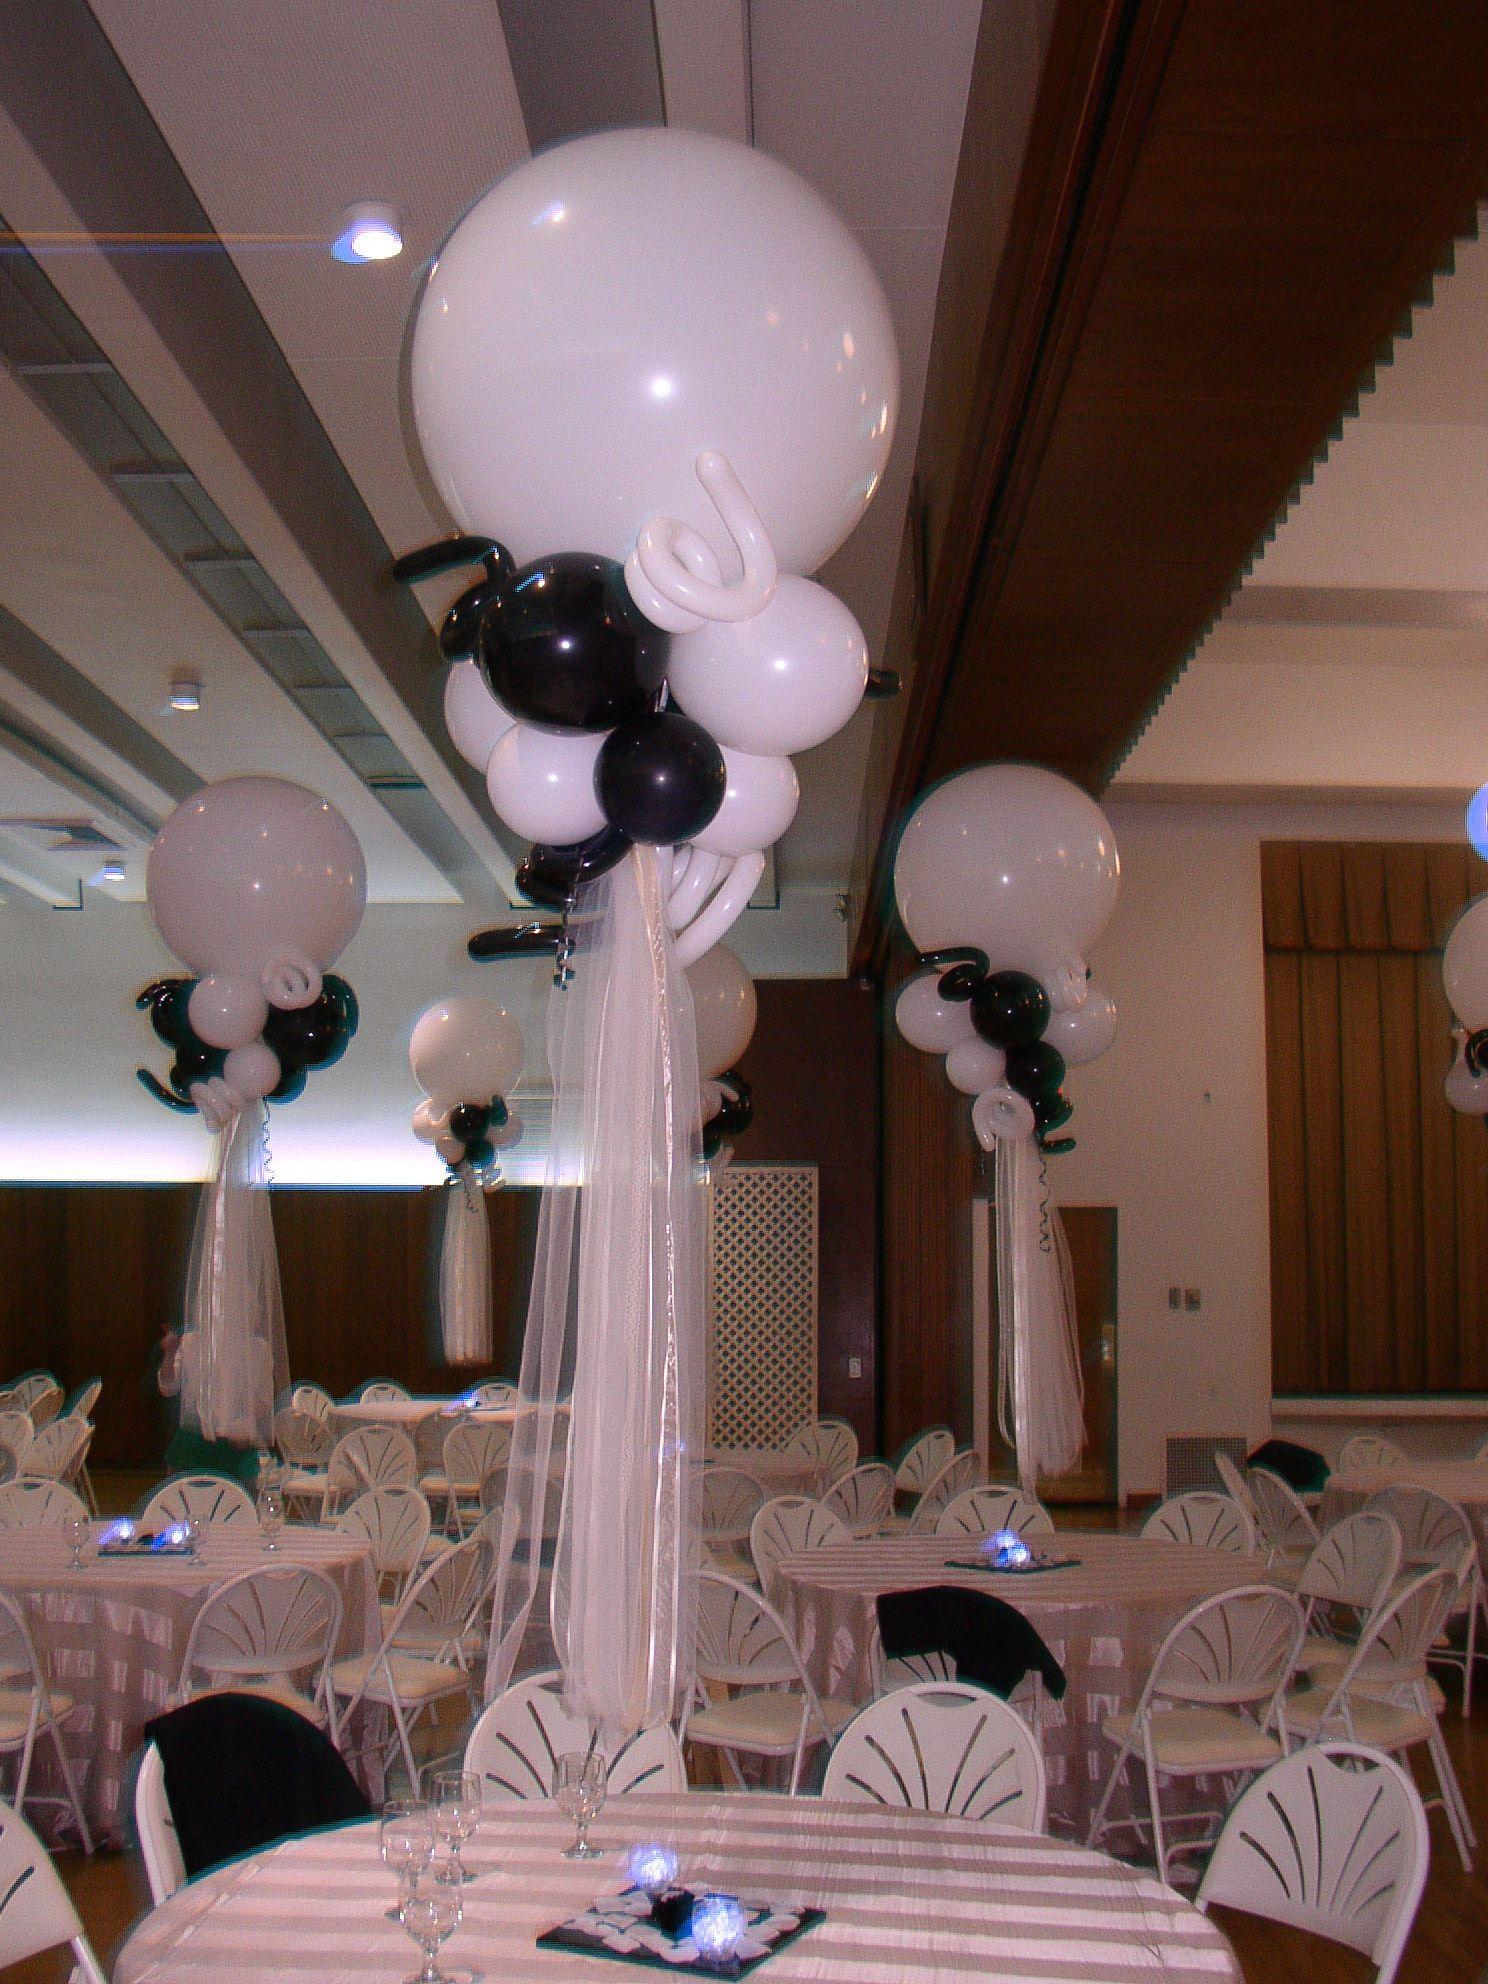 Black White Wedding Balloon Centerpieces With Led Votives Wedding Balloons Wedding Balloon Decorations Balloon Centerpieces